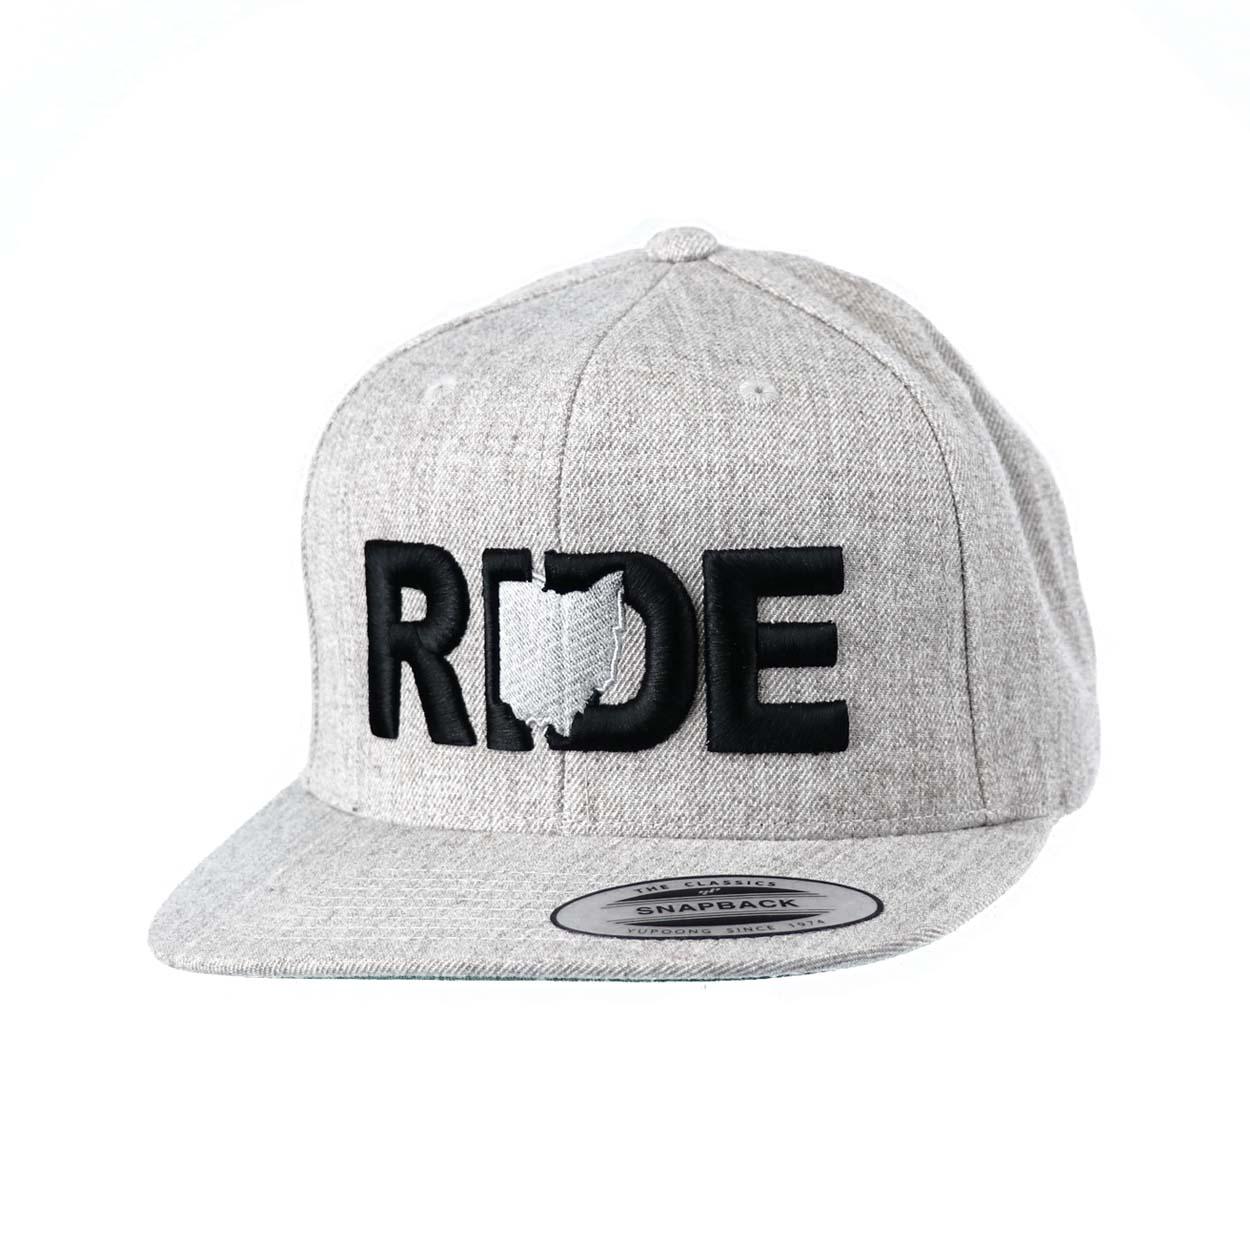 Ride Ohio Classic Embroidered  Snapback Flat Brim Hat Gray/Black